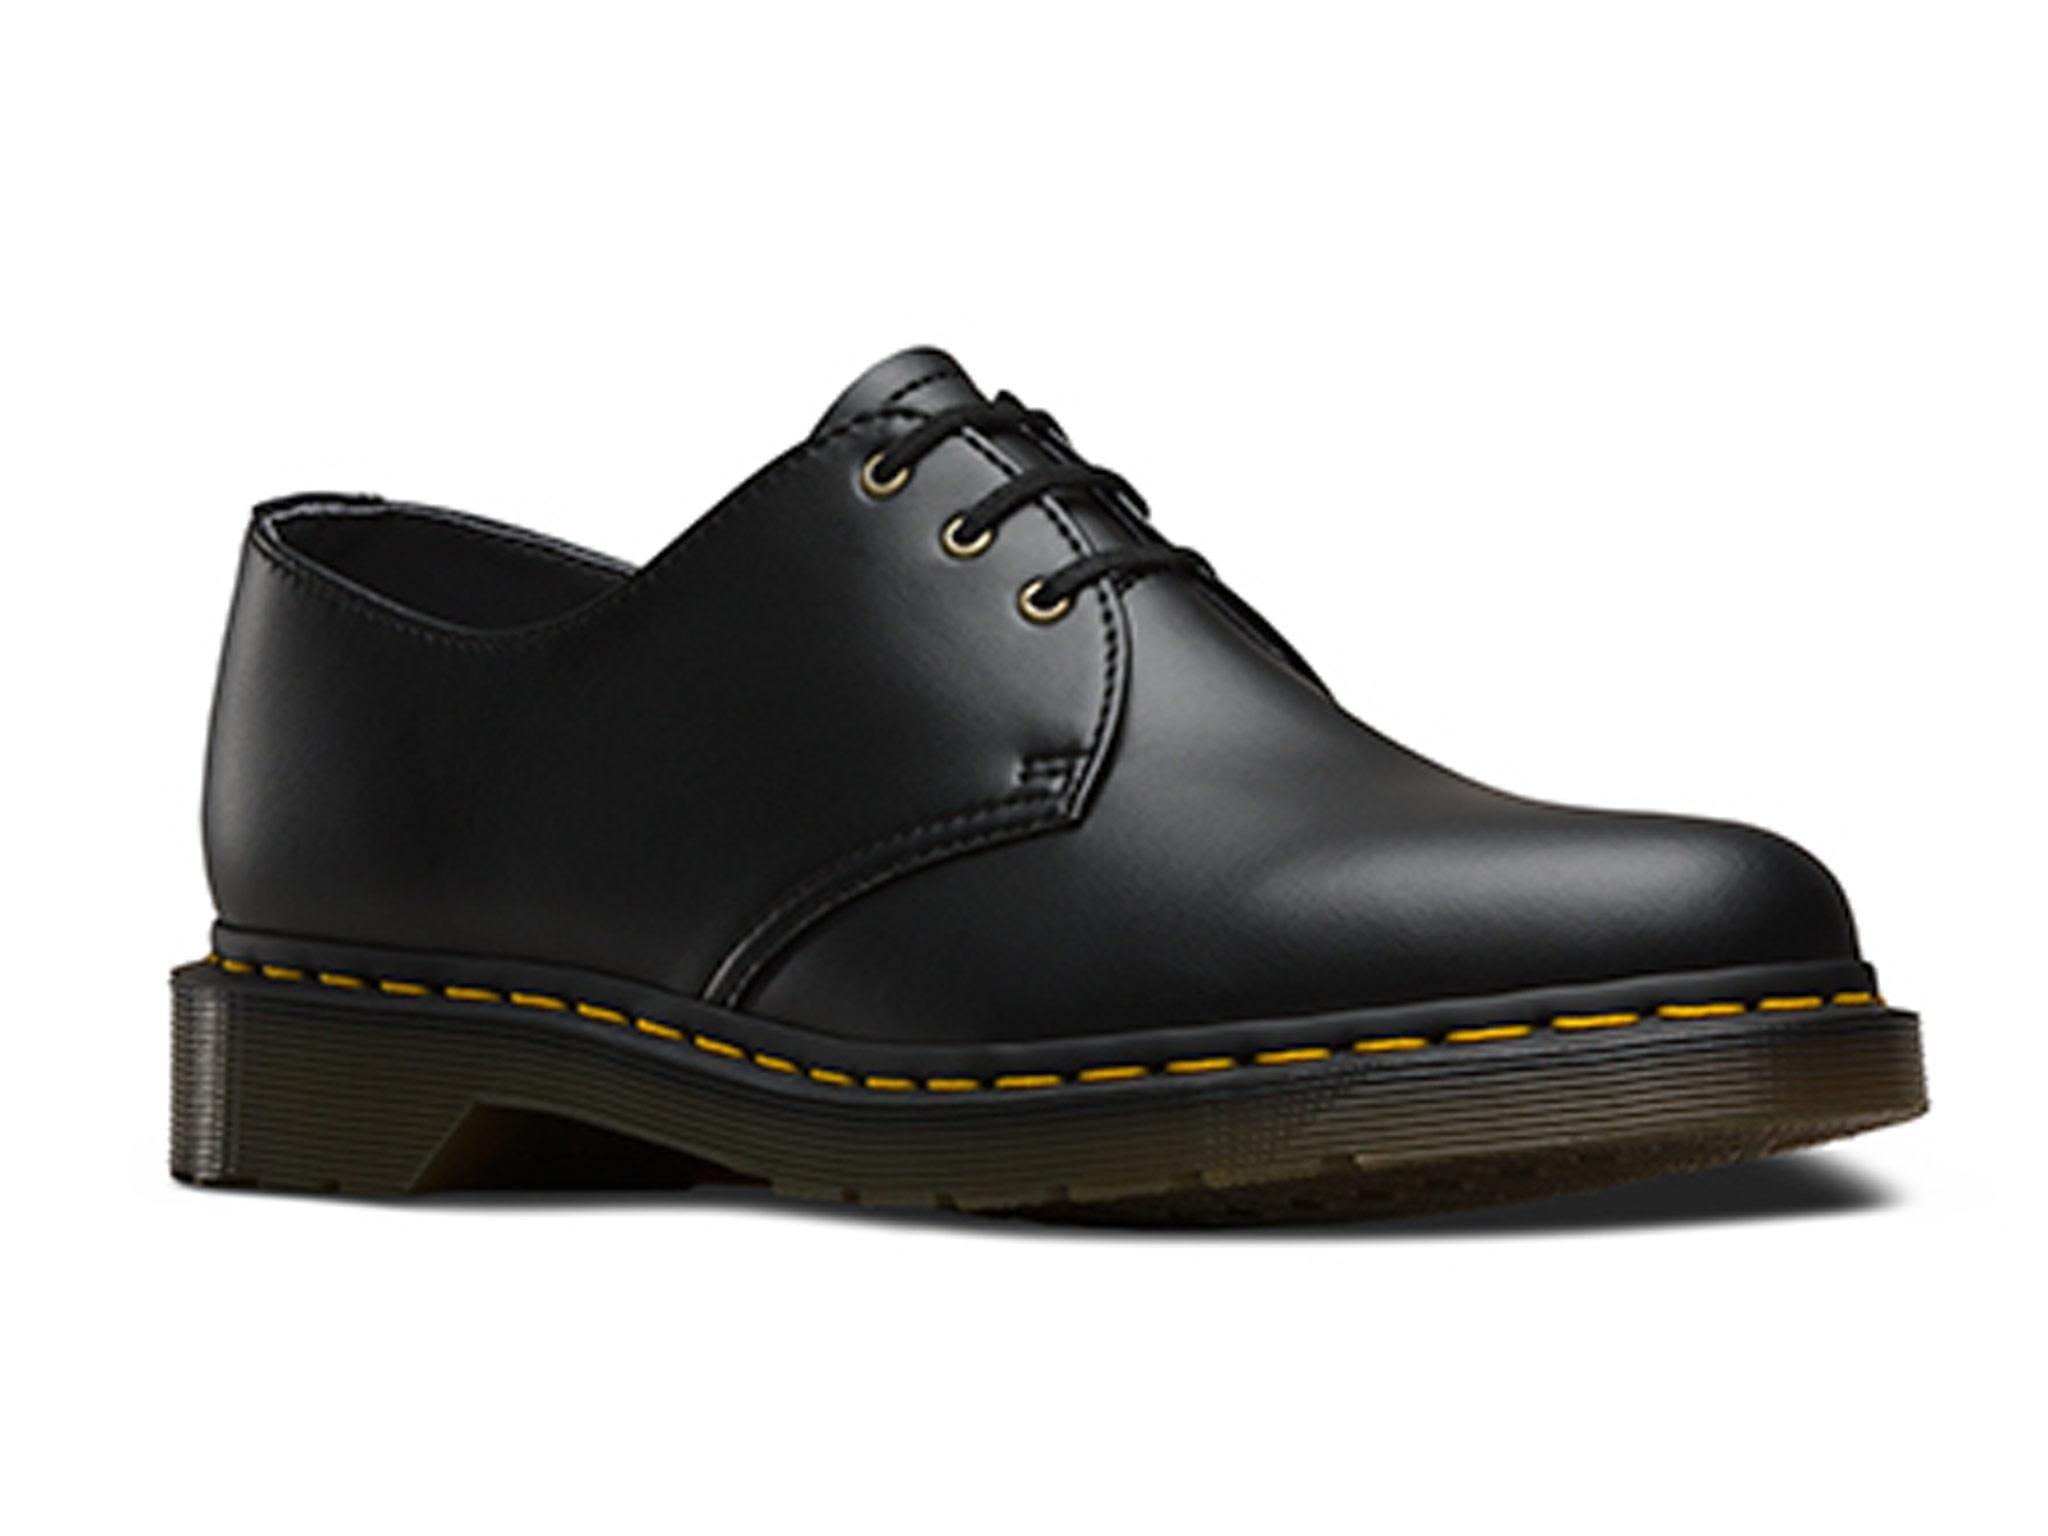 16 Best Vegan Shoes For Women The Independent Digital Burgundy Canvas Chocolate Leather Dr Martens Black Felix Rub Off 115